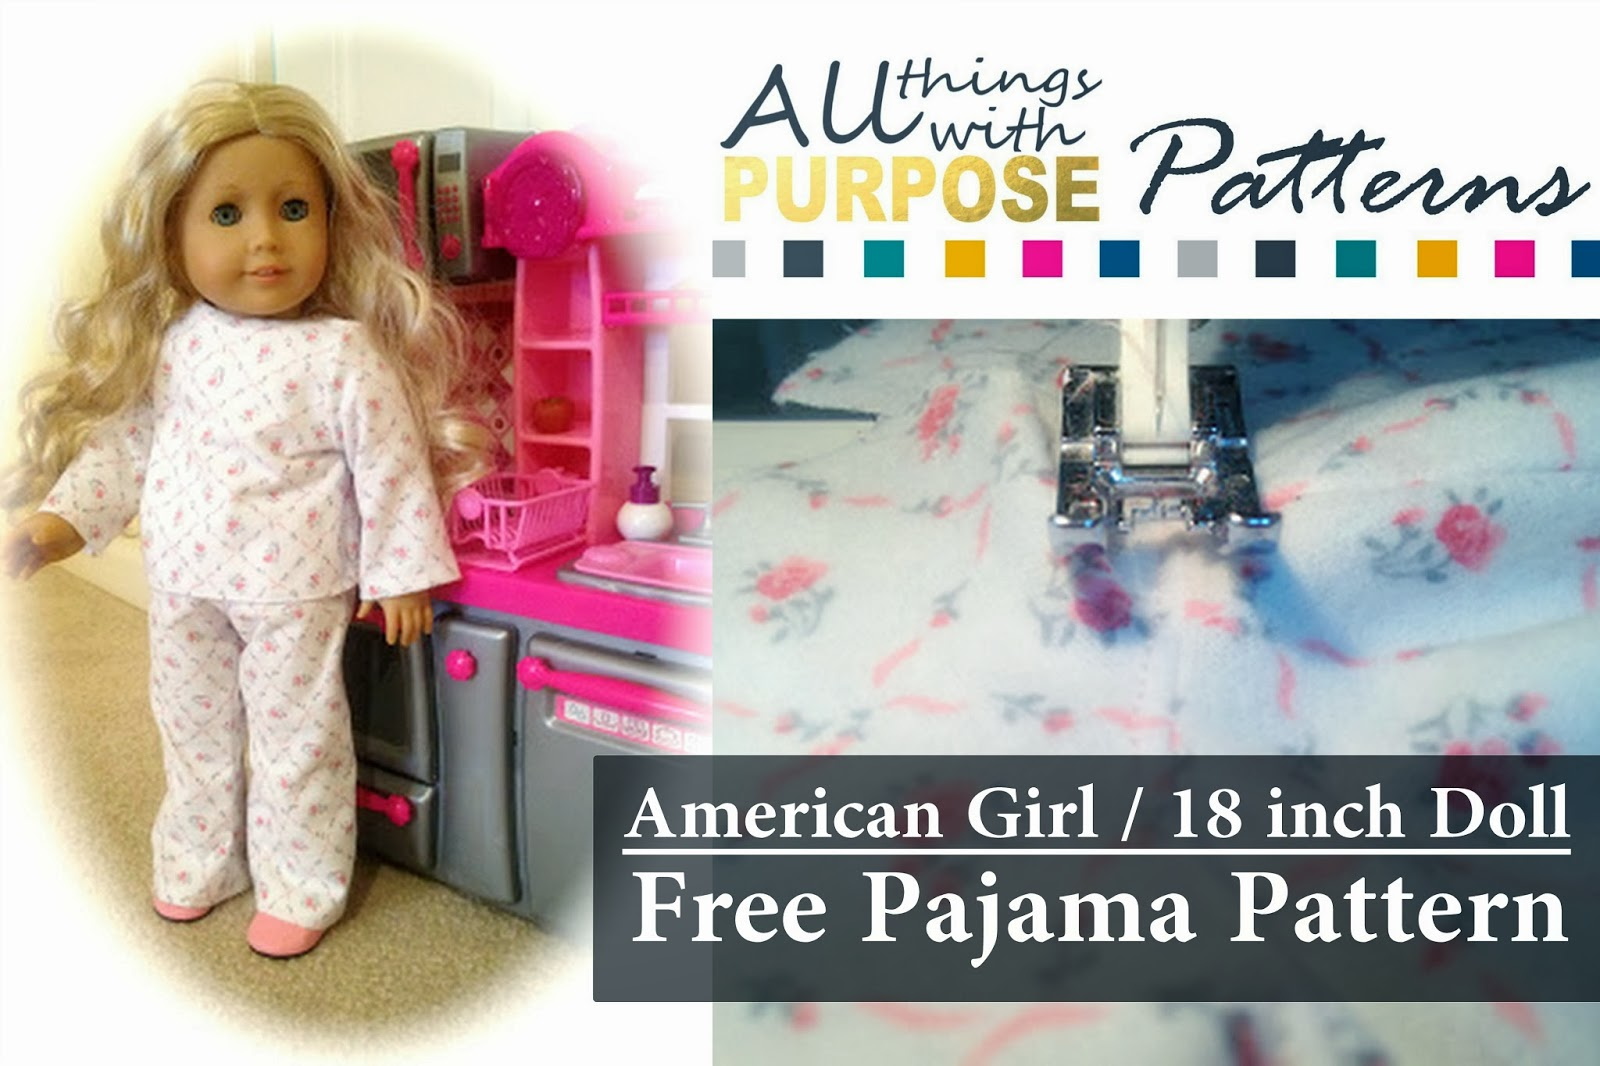 American Girl Doll PJ's {FREE} Pattern